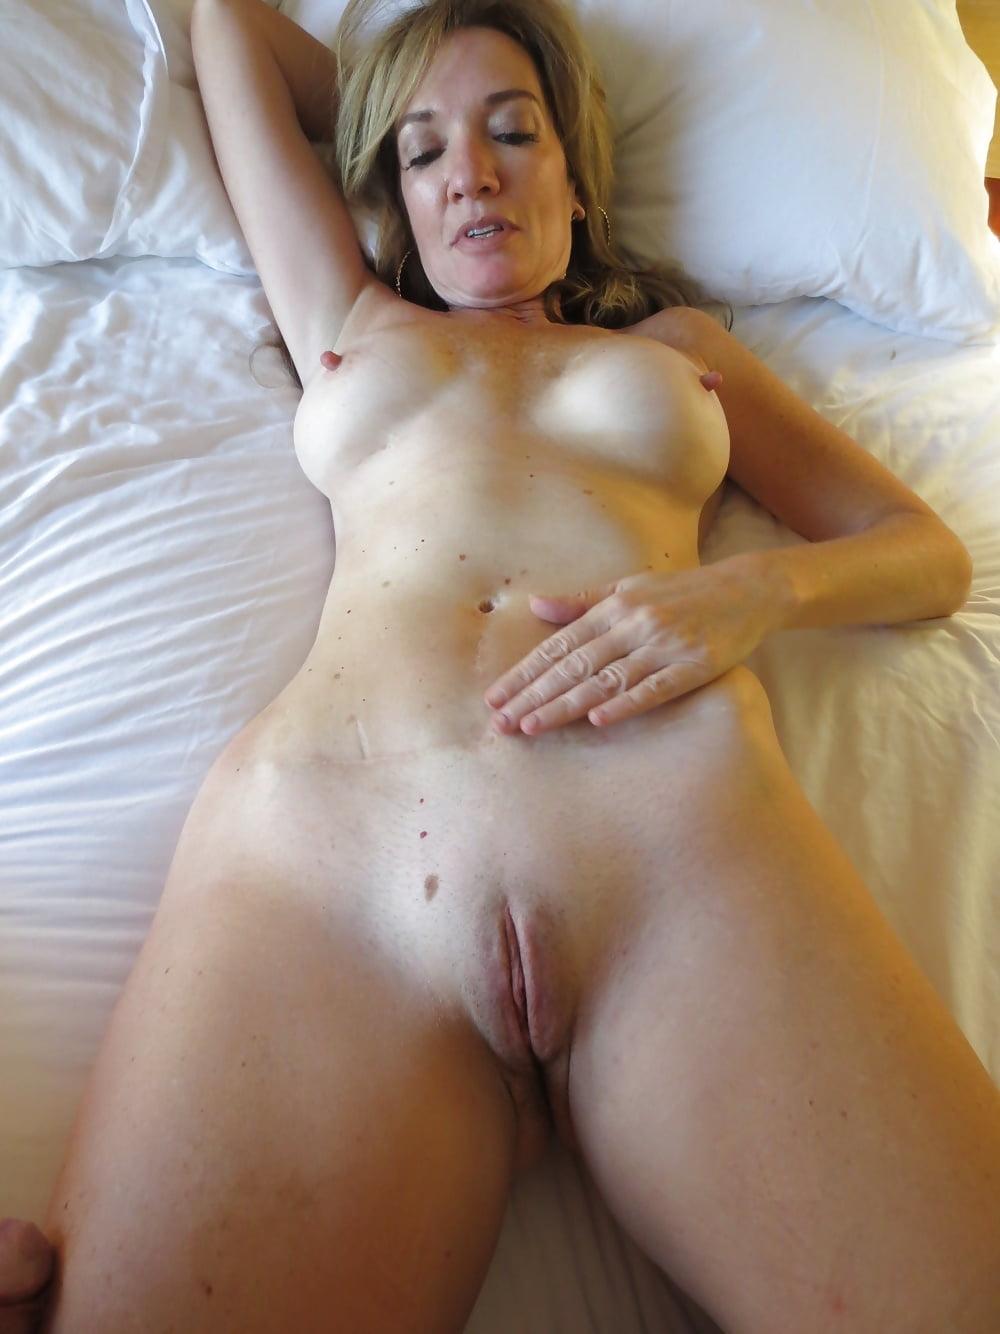 tumblr-amature-nudes-brazilian-nadine-singapore